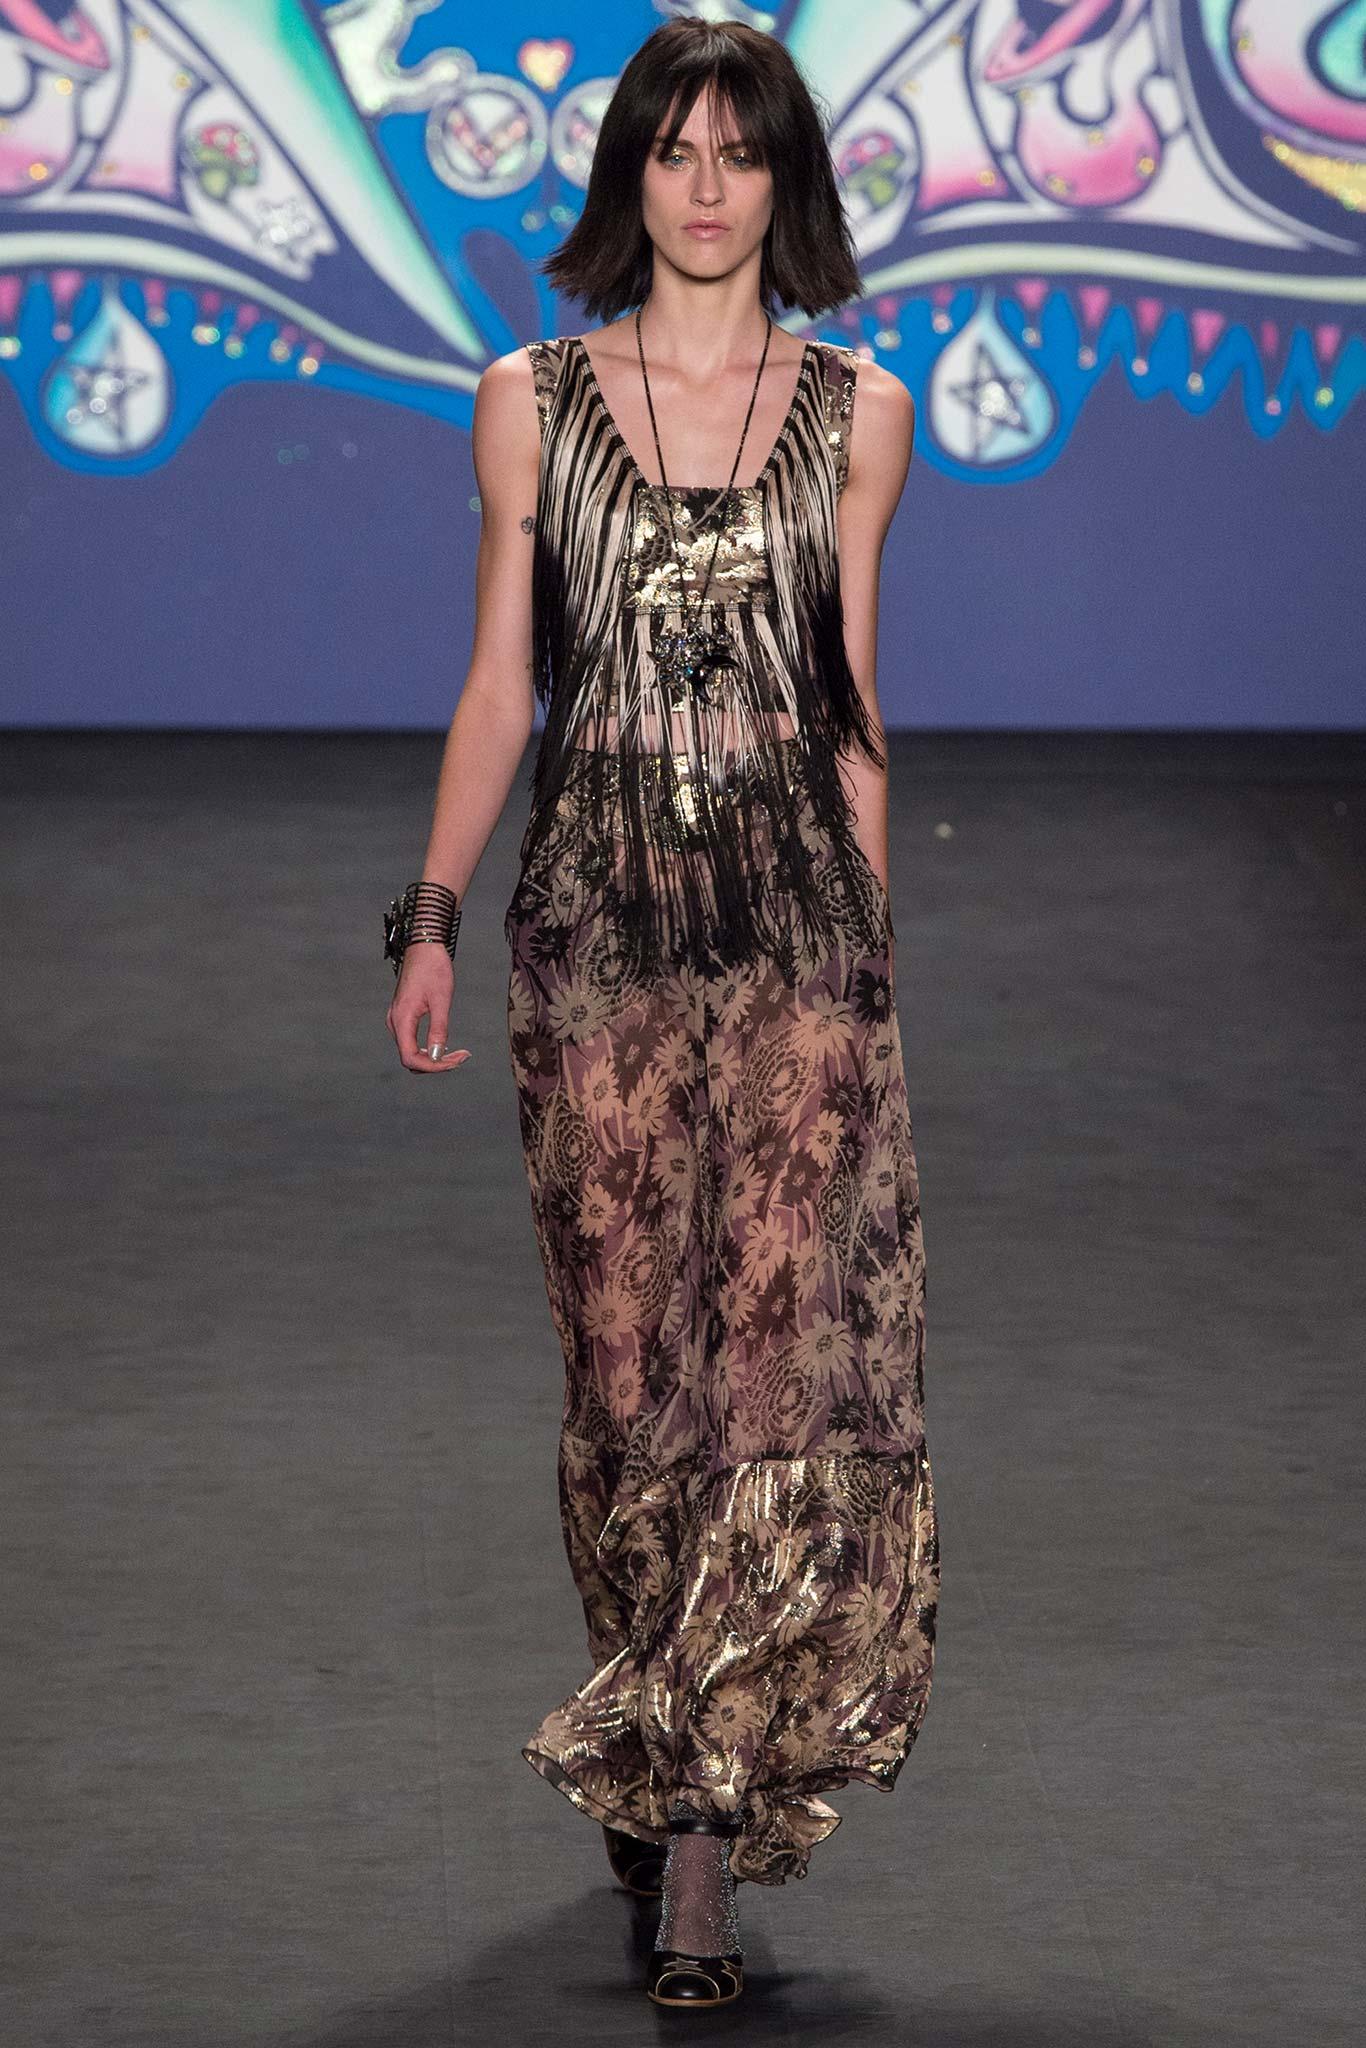 Hairstyles bridal long hair pakistani, Wedding ebay dresses from china